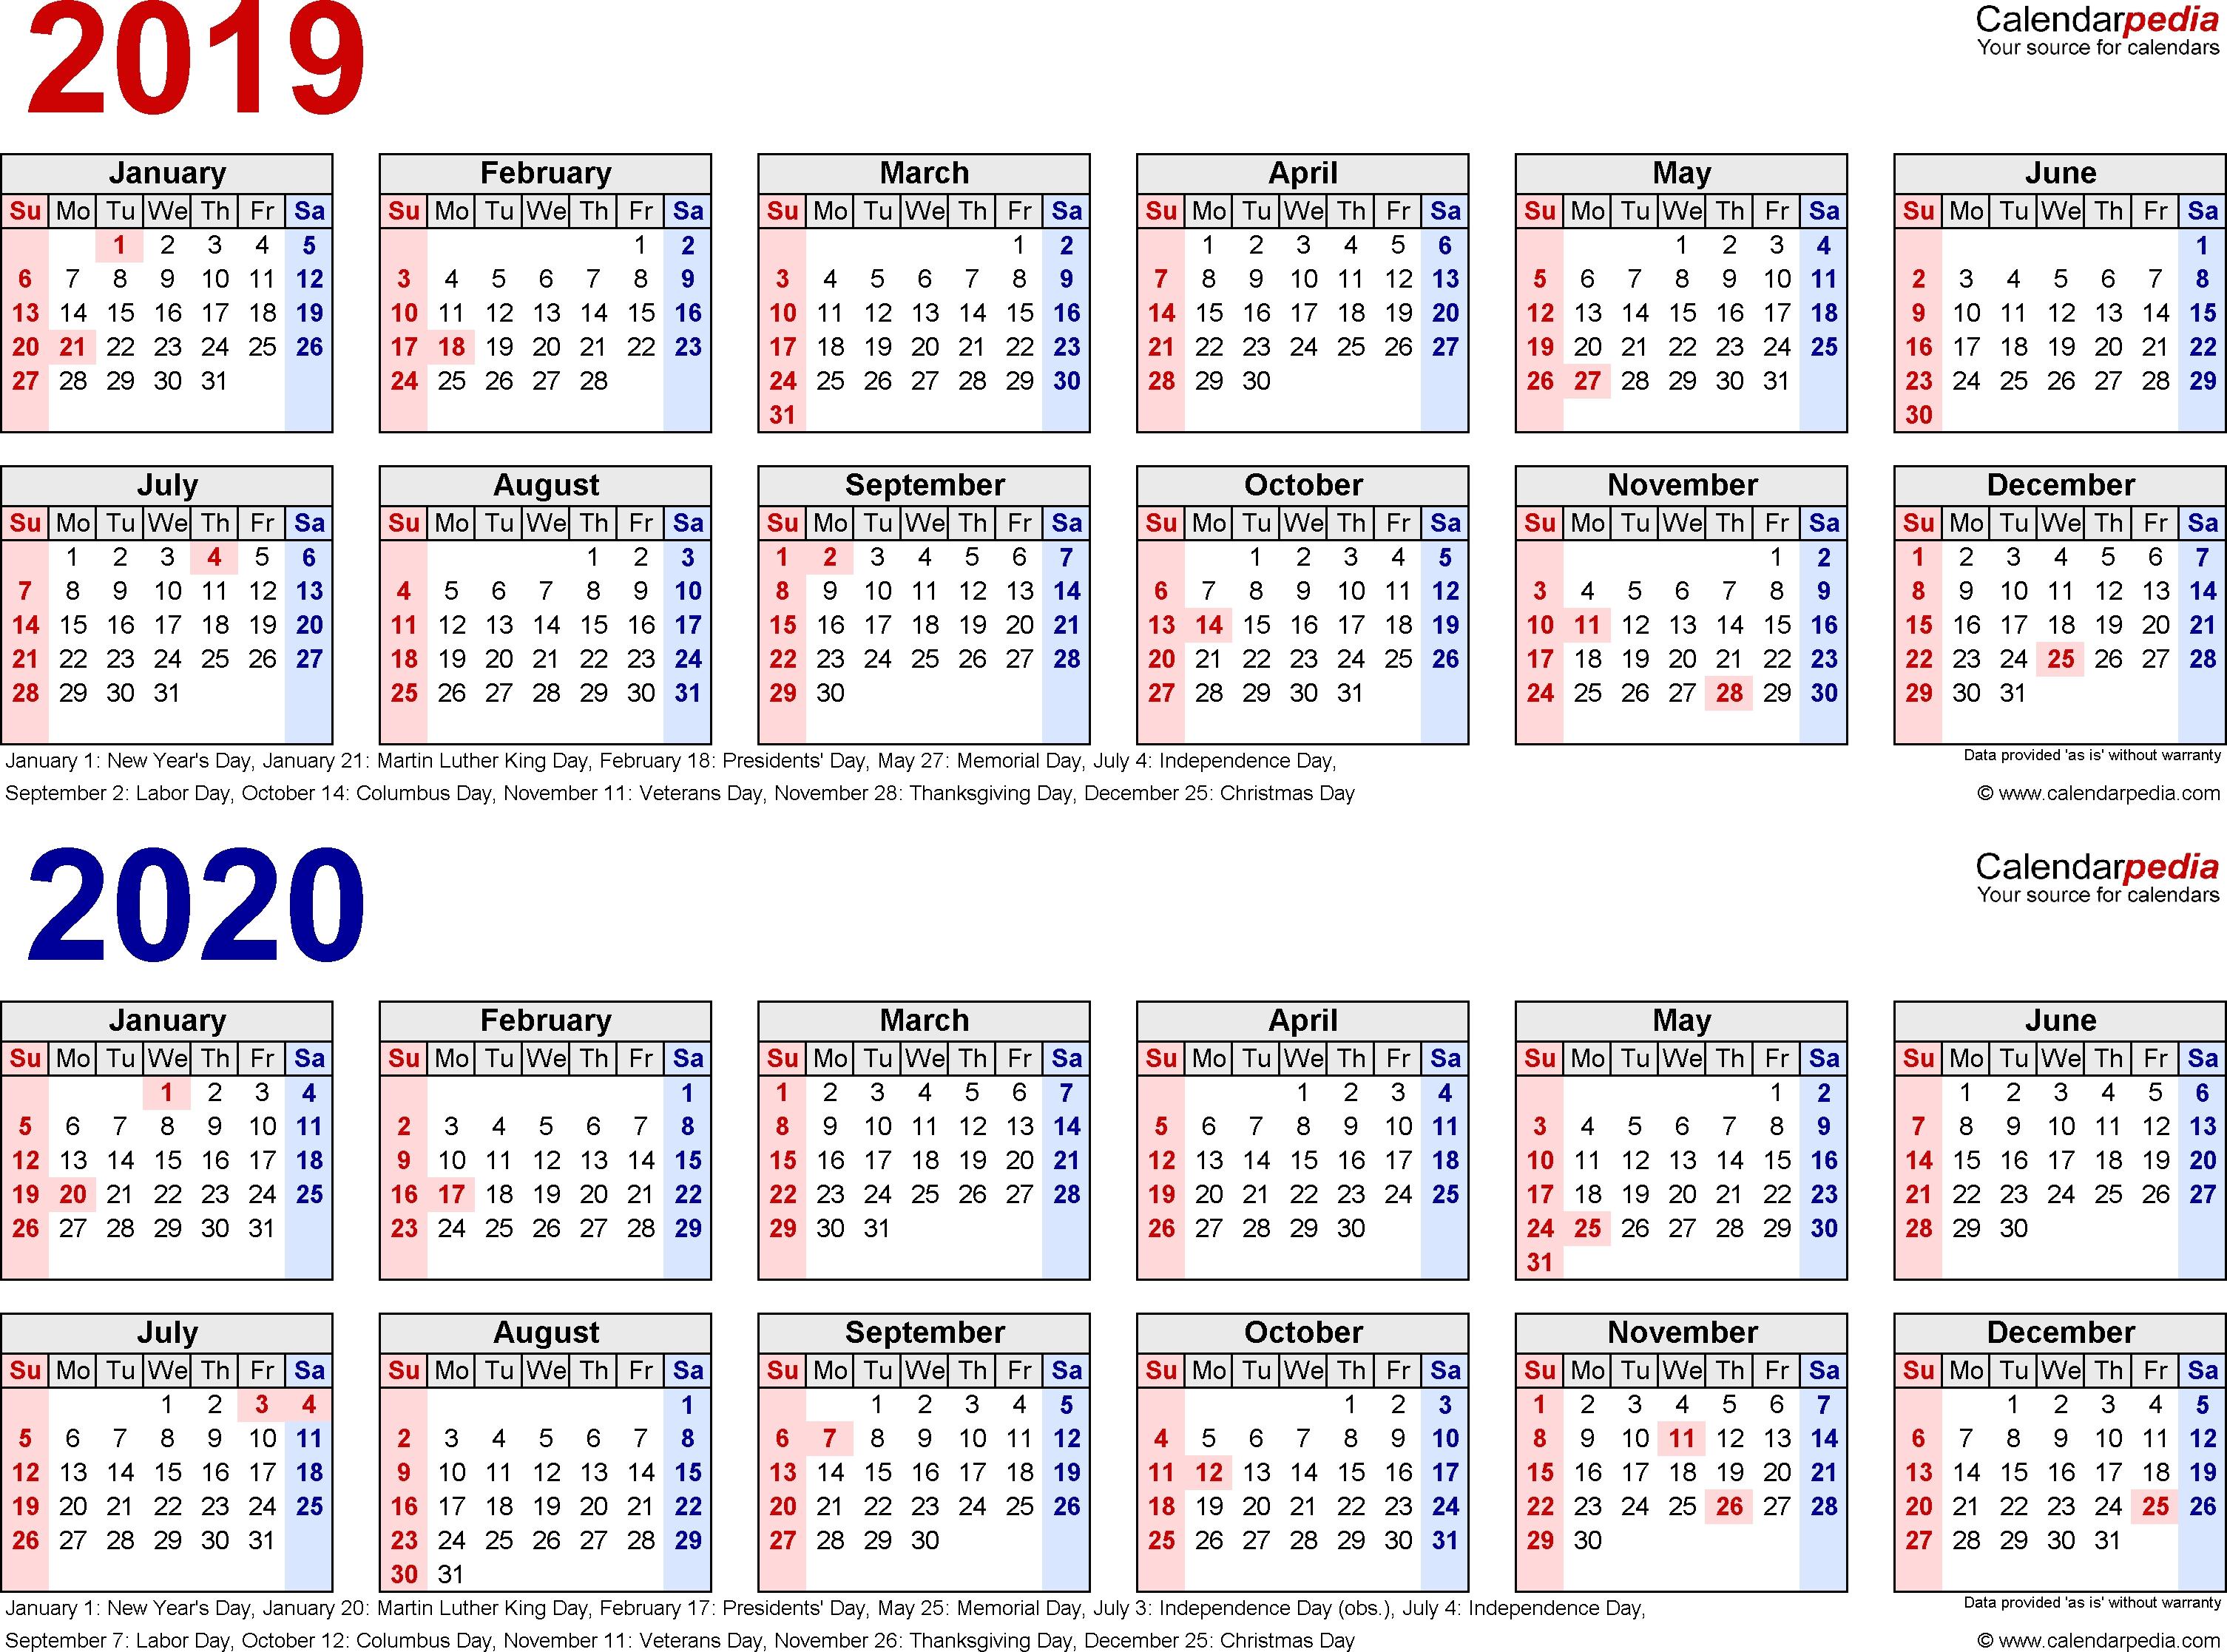 2019-2020 Calendar - Free Printable Two-Year Pdf Calendars throughout 5X 7 Printable 2019-2020